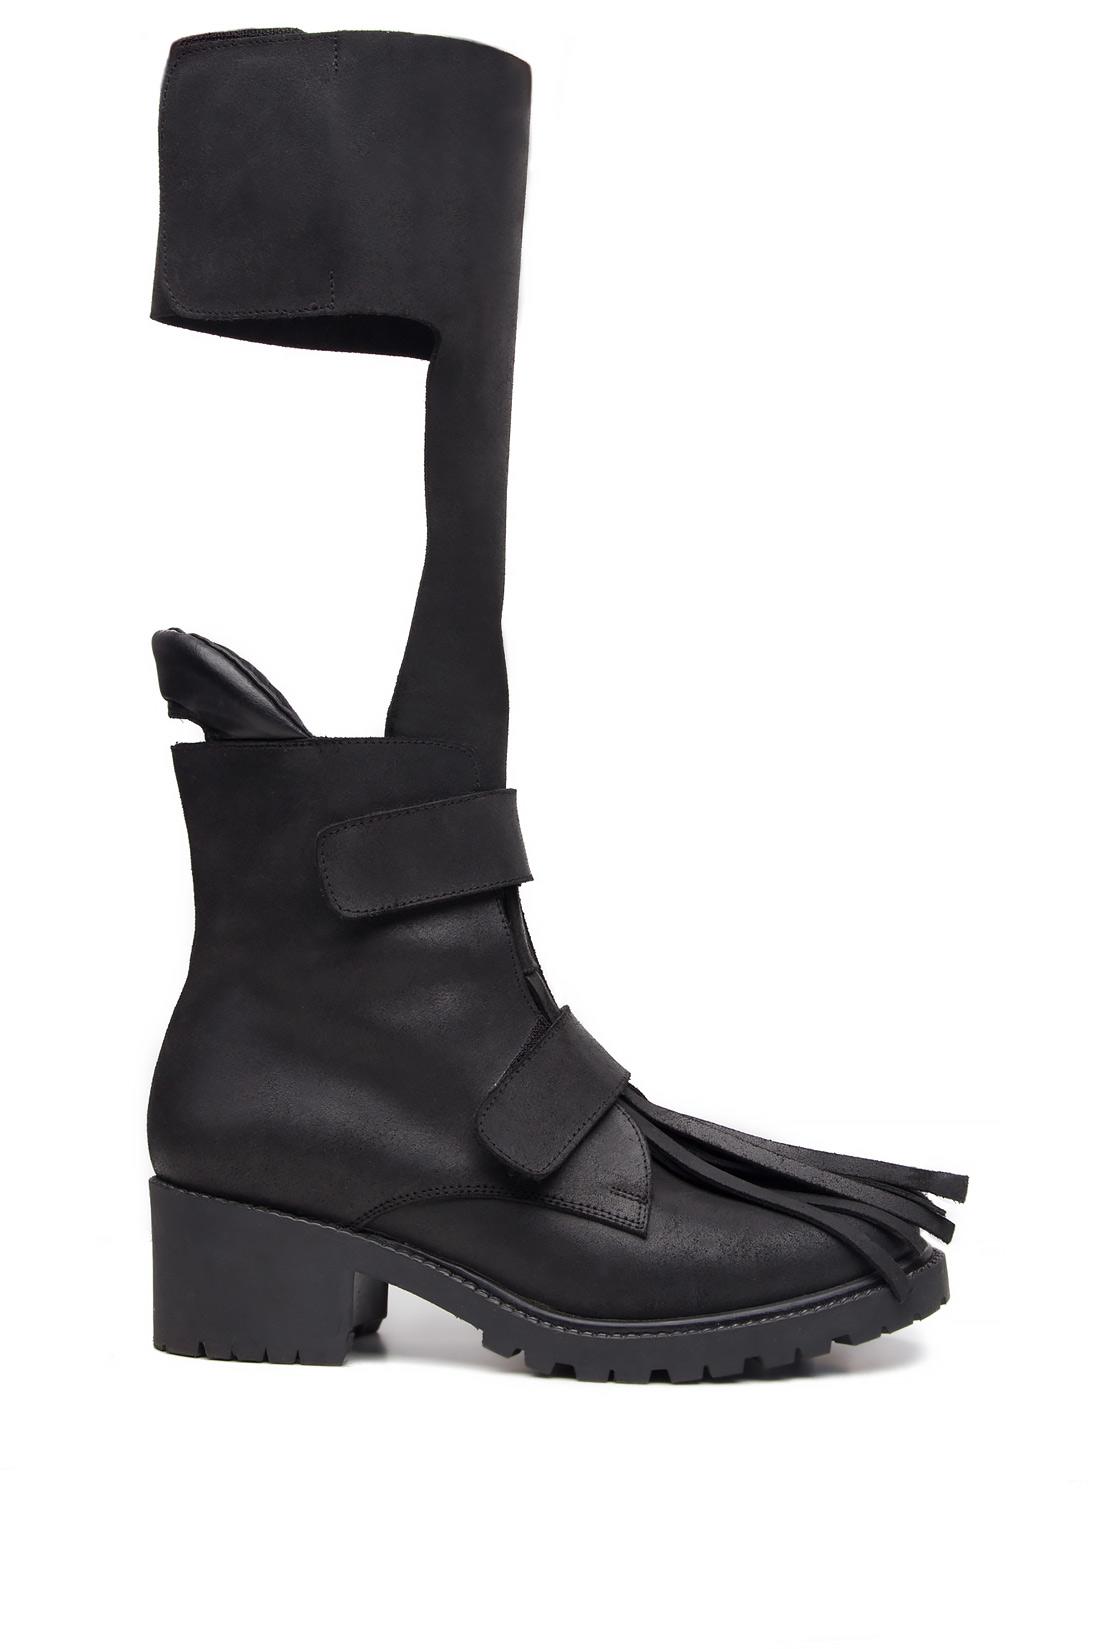 Fringed cutout leather ankle boots Mihaela Glavan  image 0